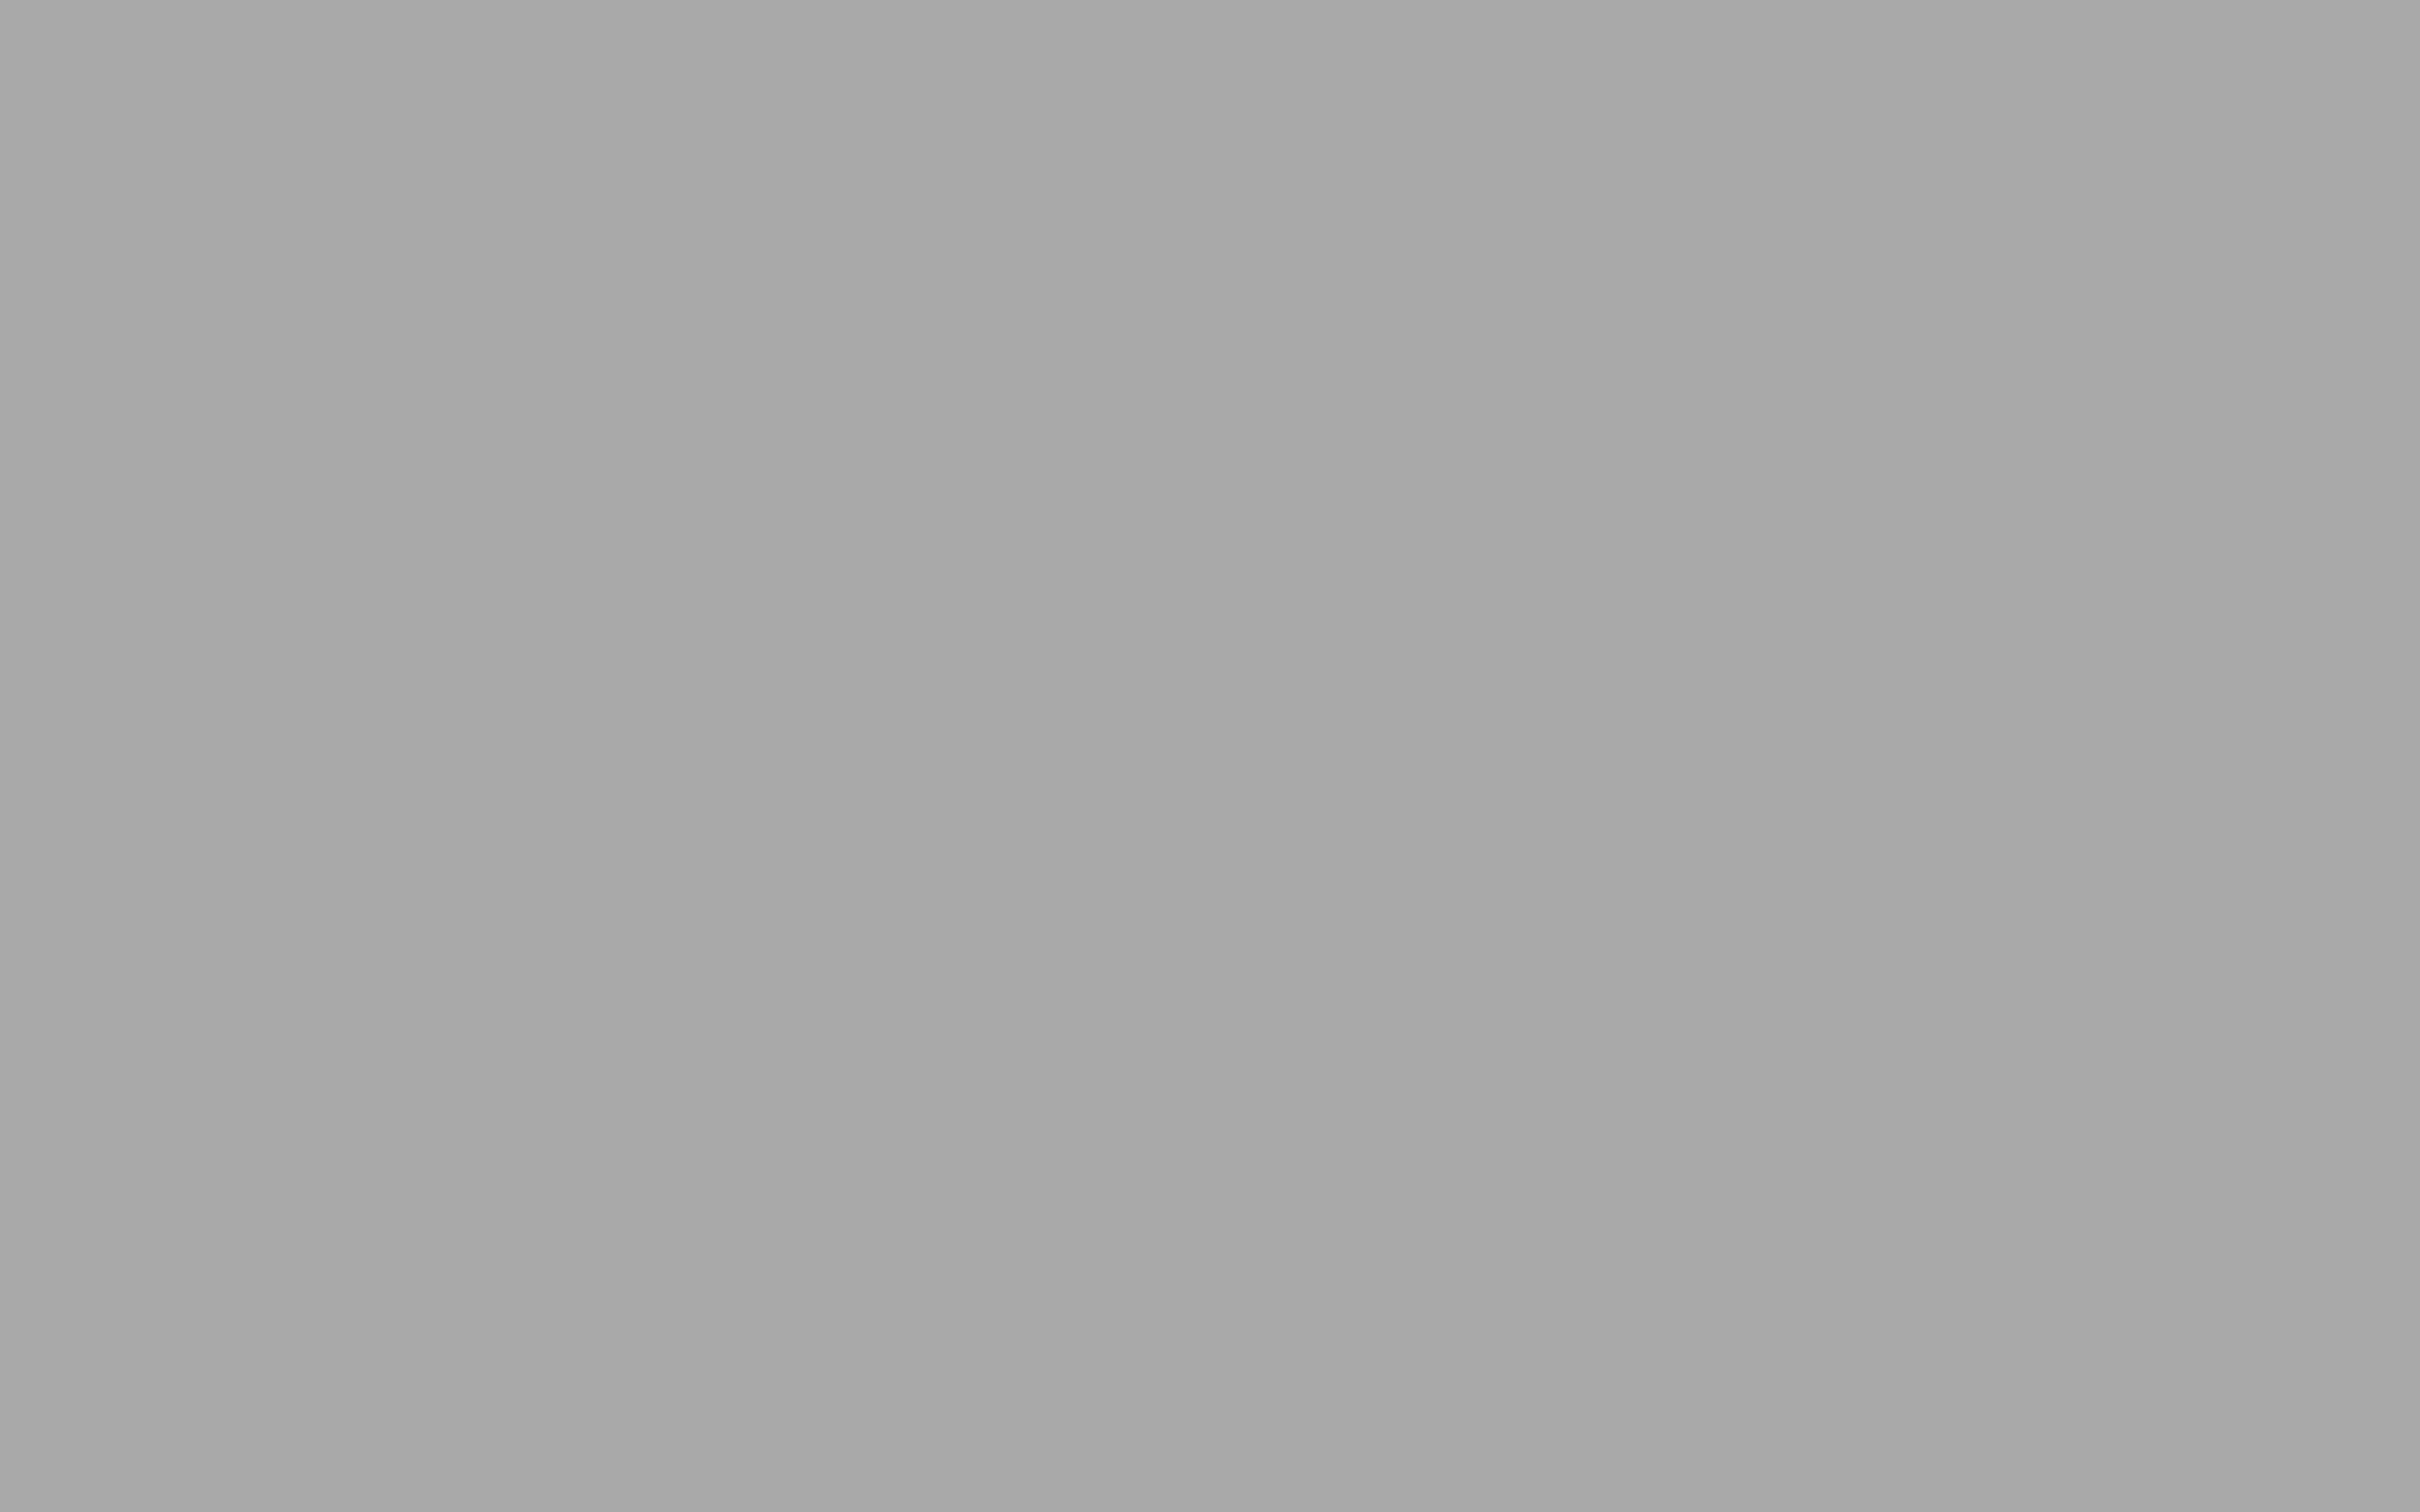 solid dark gray background 2560x1600 dark gray solid